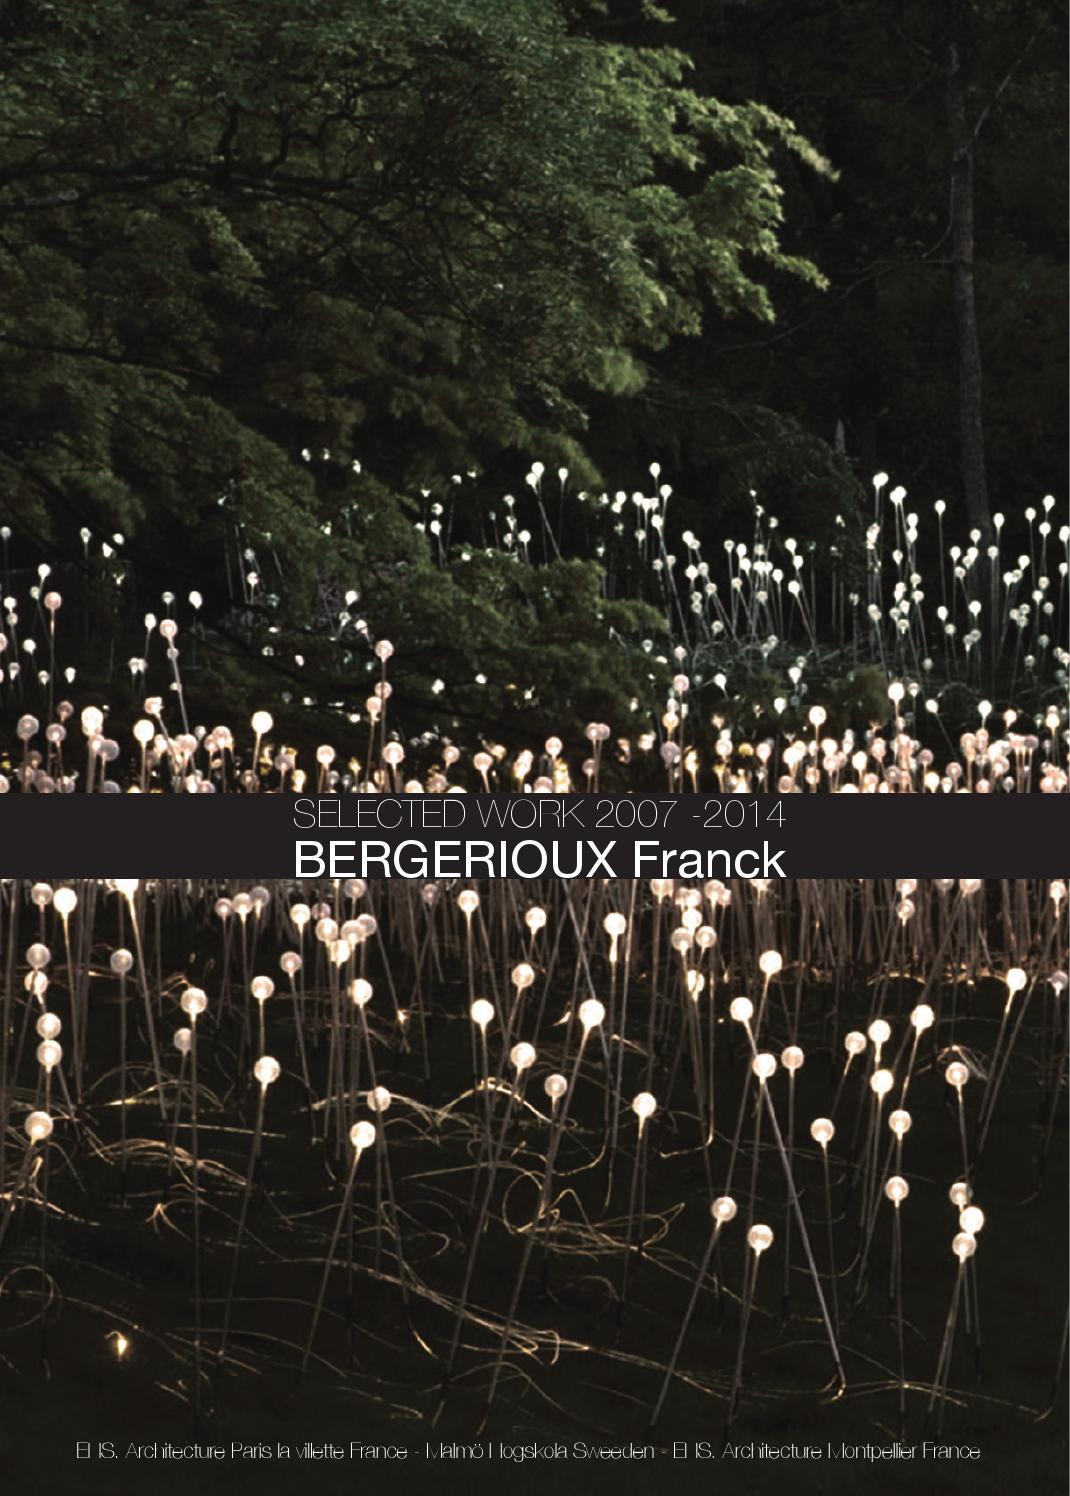 book 2014 bergerioux franck by franck bergerioux issuu. Black Bedroom Furniture Sets. Home Design Ideas